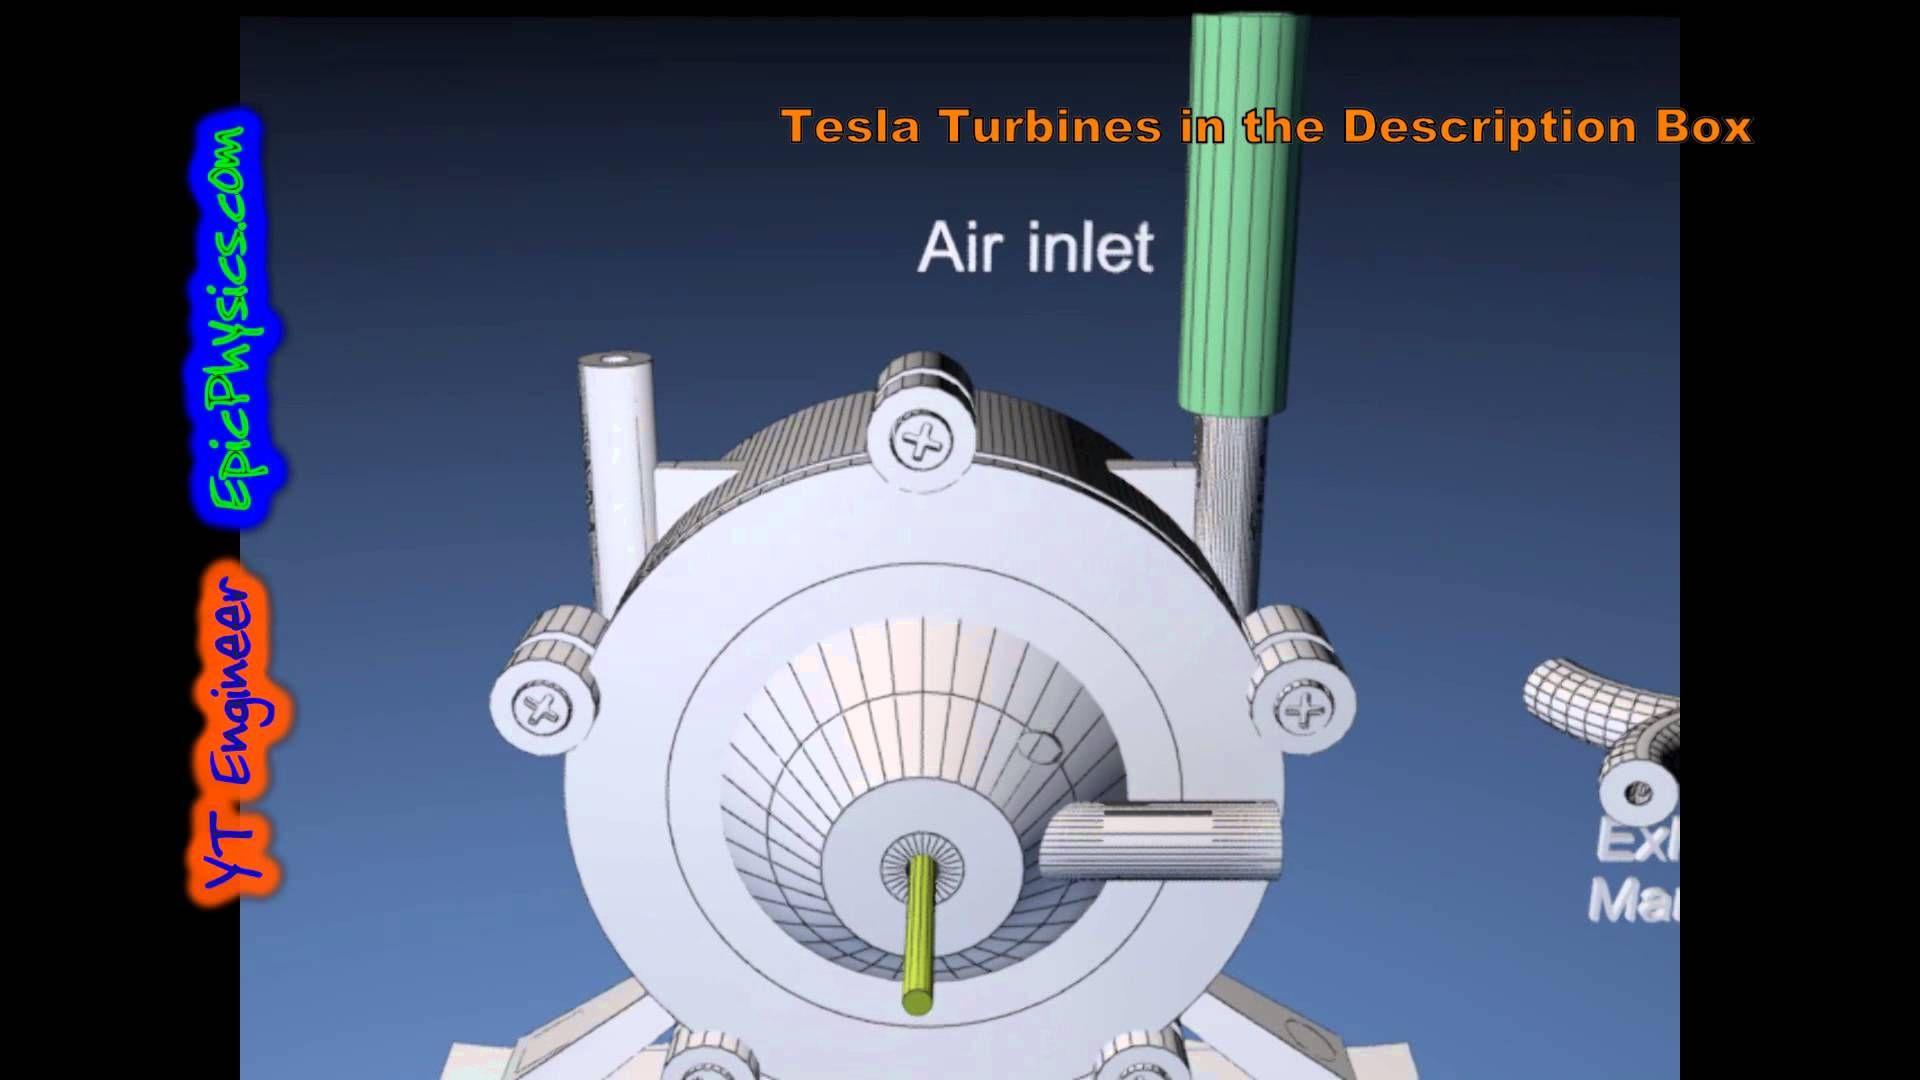 Nikola Tesla's Turbine www.SELLaBIZ.gr ΠΩΛΗΣΕΙΣ ΕΠΙΧΕΙΡΗΣΕΩΝ ΔΩΡΕΑΝ ΑΓΓΕΛΙΕΣ ΠΩΛΗΣΗΣ ΕΠΙΧΕΙΡΗΣΗΣ BUSINESS FOR SALE FREE OF CHARGE PUBLICATION